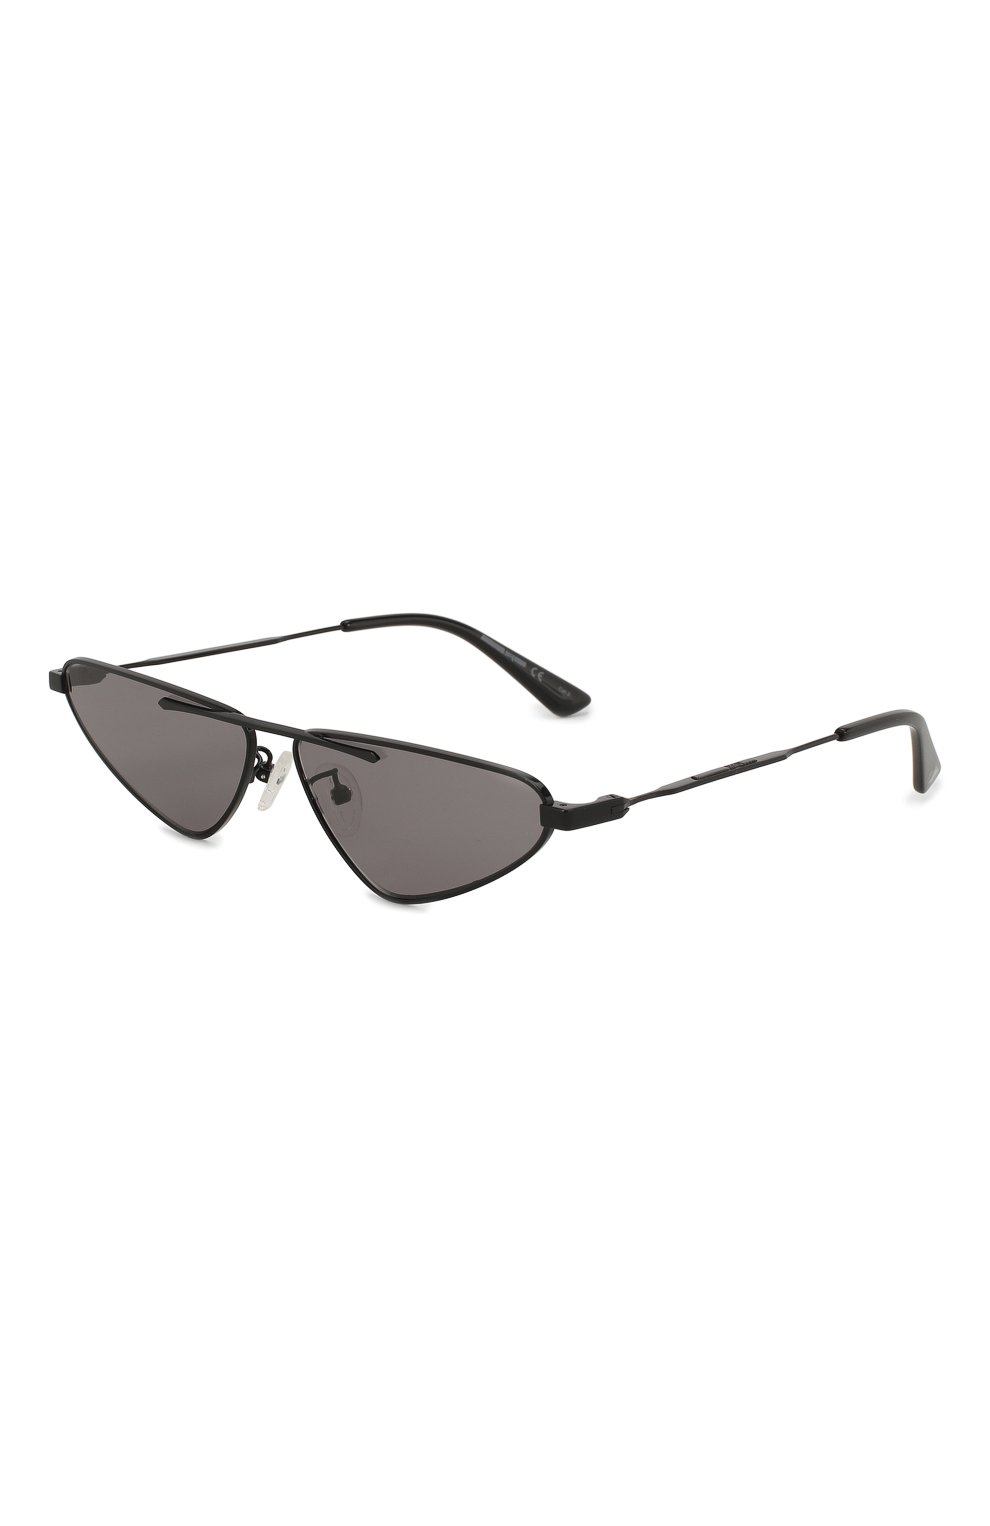 Женские солнцезащитные очки MCQ SWALLOW черного цвета, арт. MQ0226 001 | Фото 1